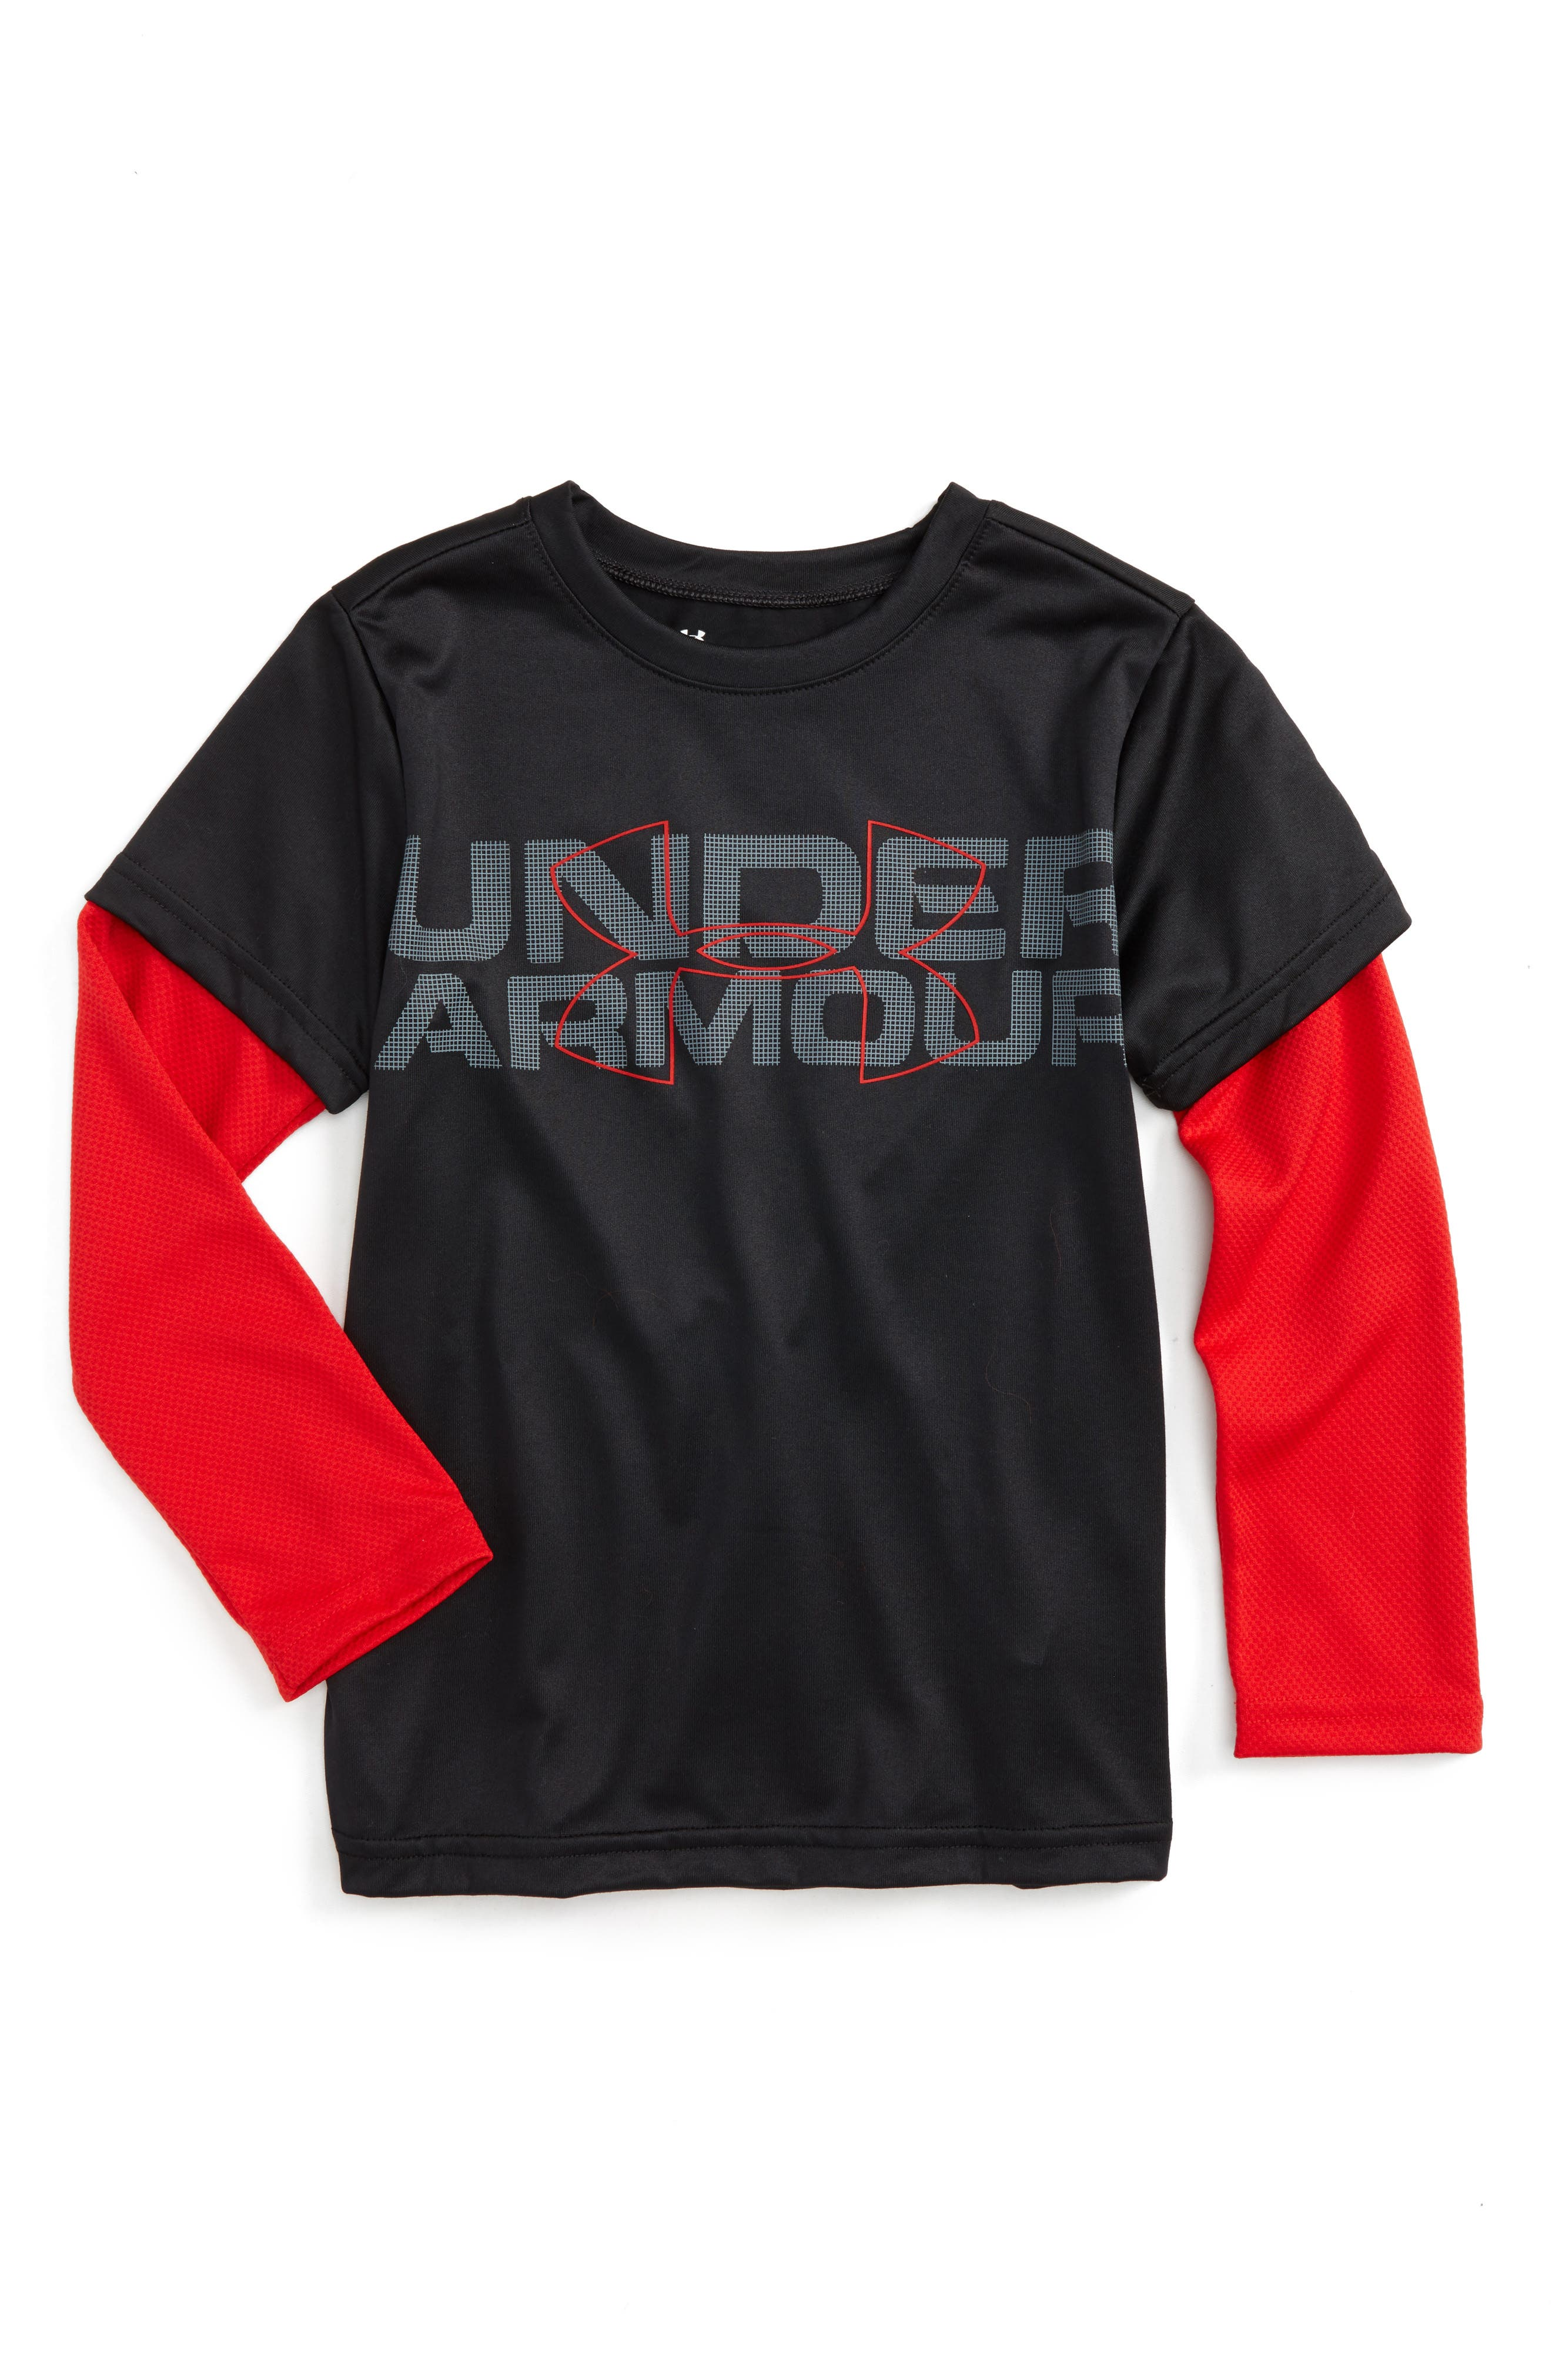 Under Armour Wordmark Slider Layered T-Shirt (Toddler Boys & Little Boys)